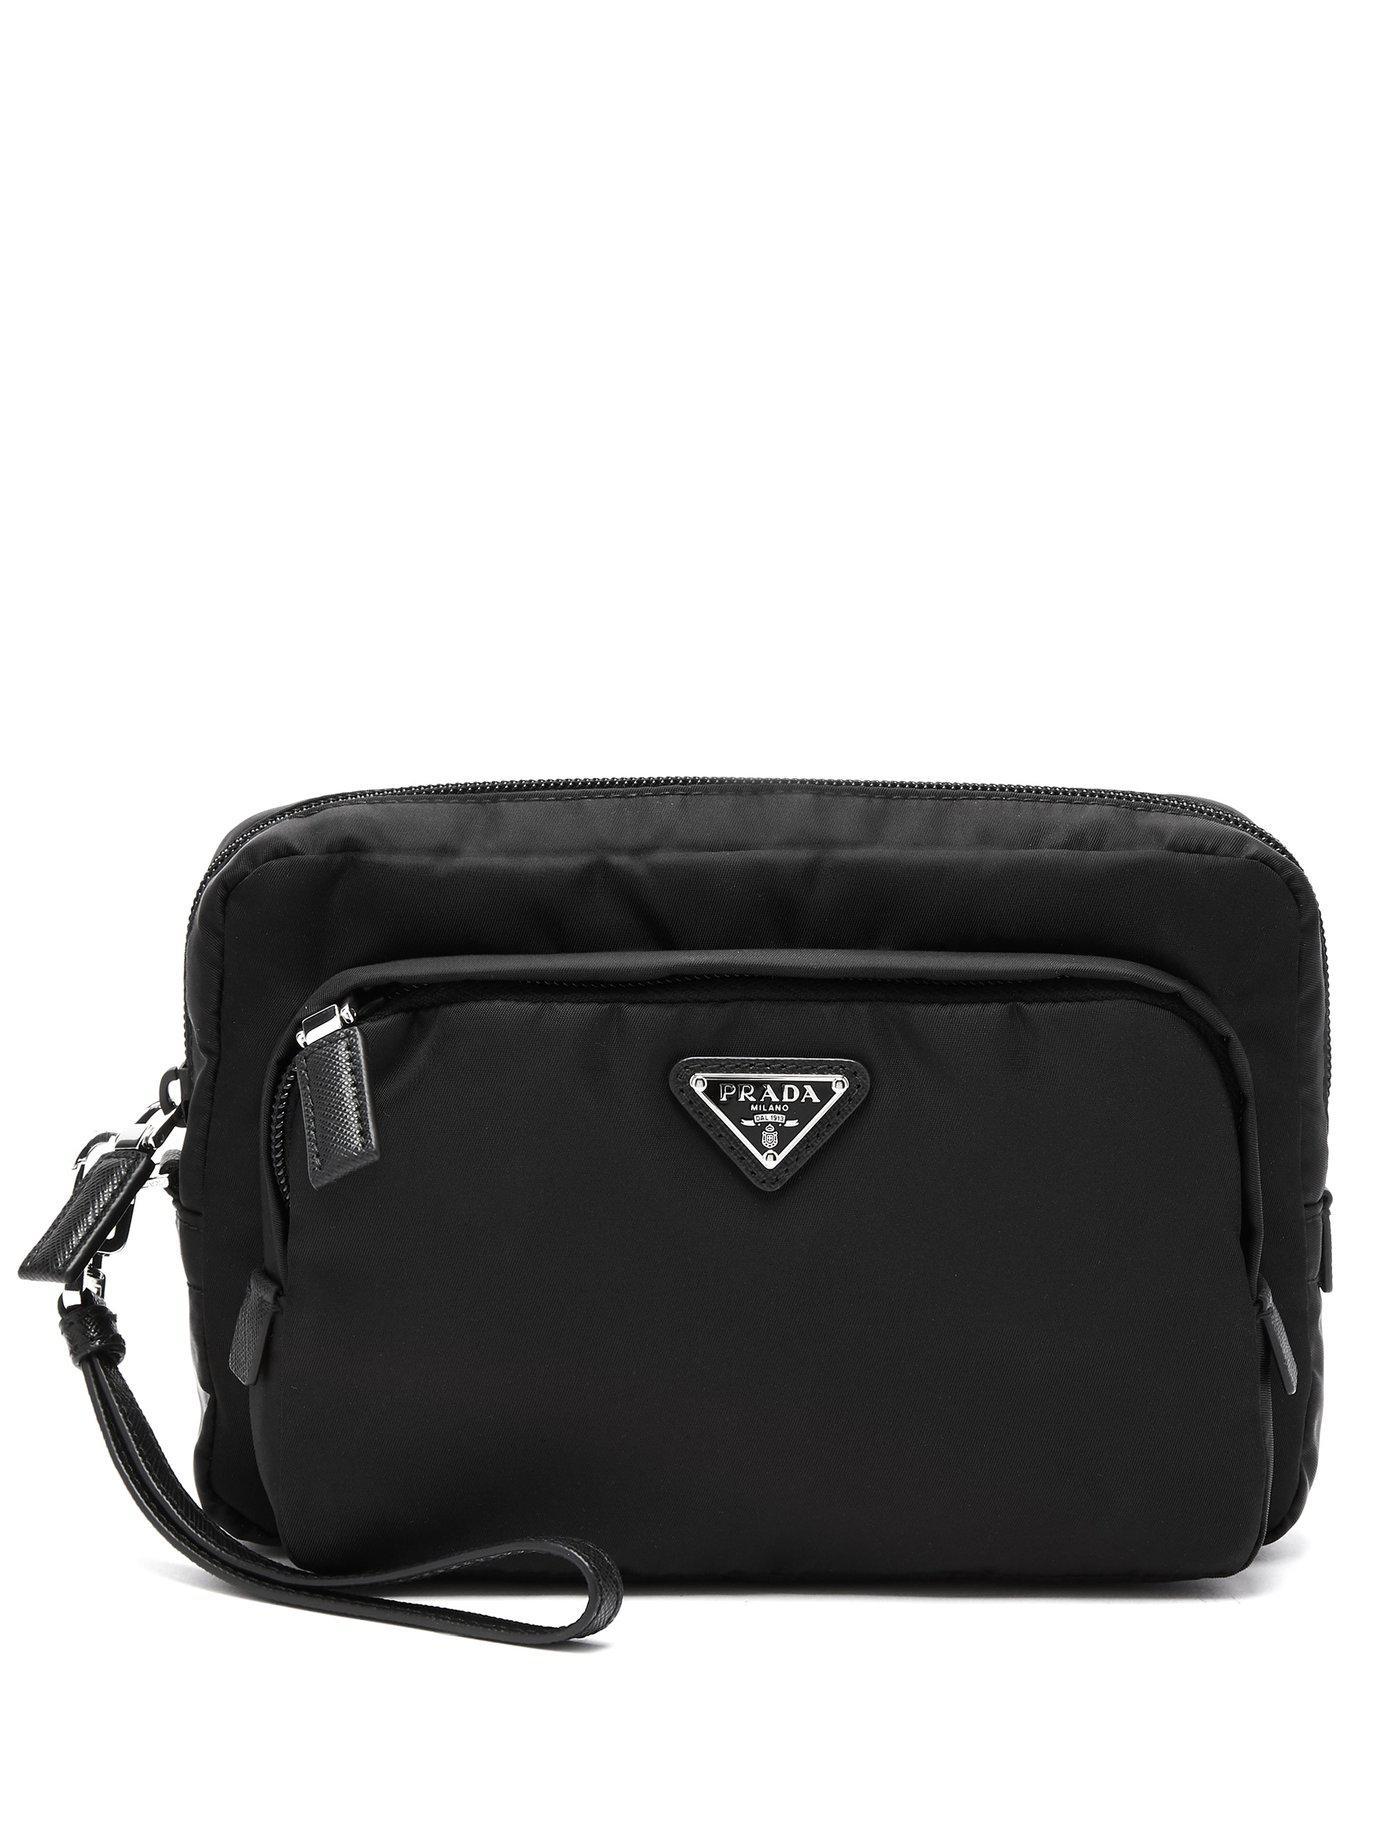 74fc54fe263565 Prada - Black Logo Embellished Nylon Camera Pouch for Men - Lyst. View  fullscreen